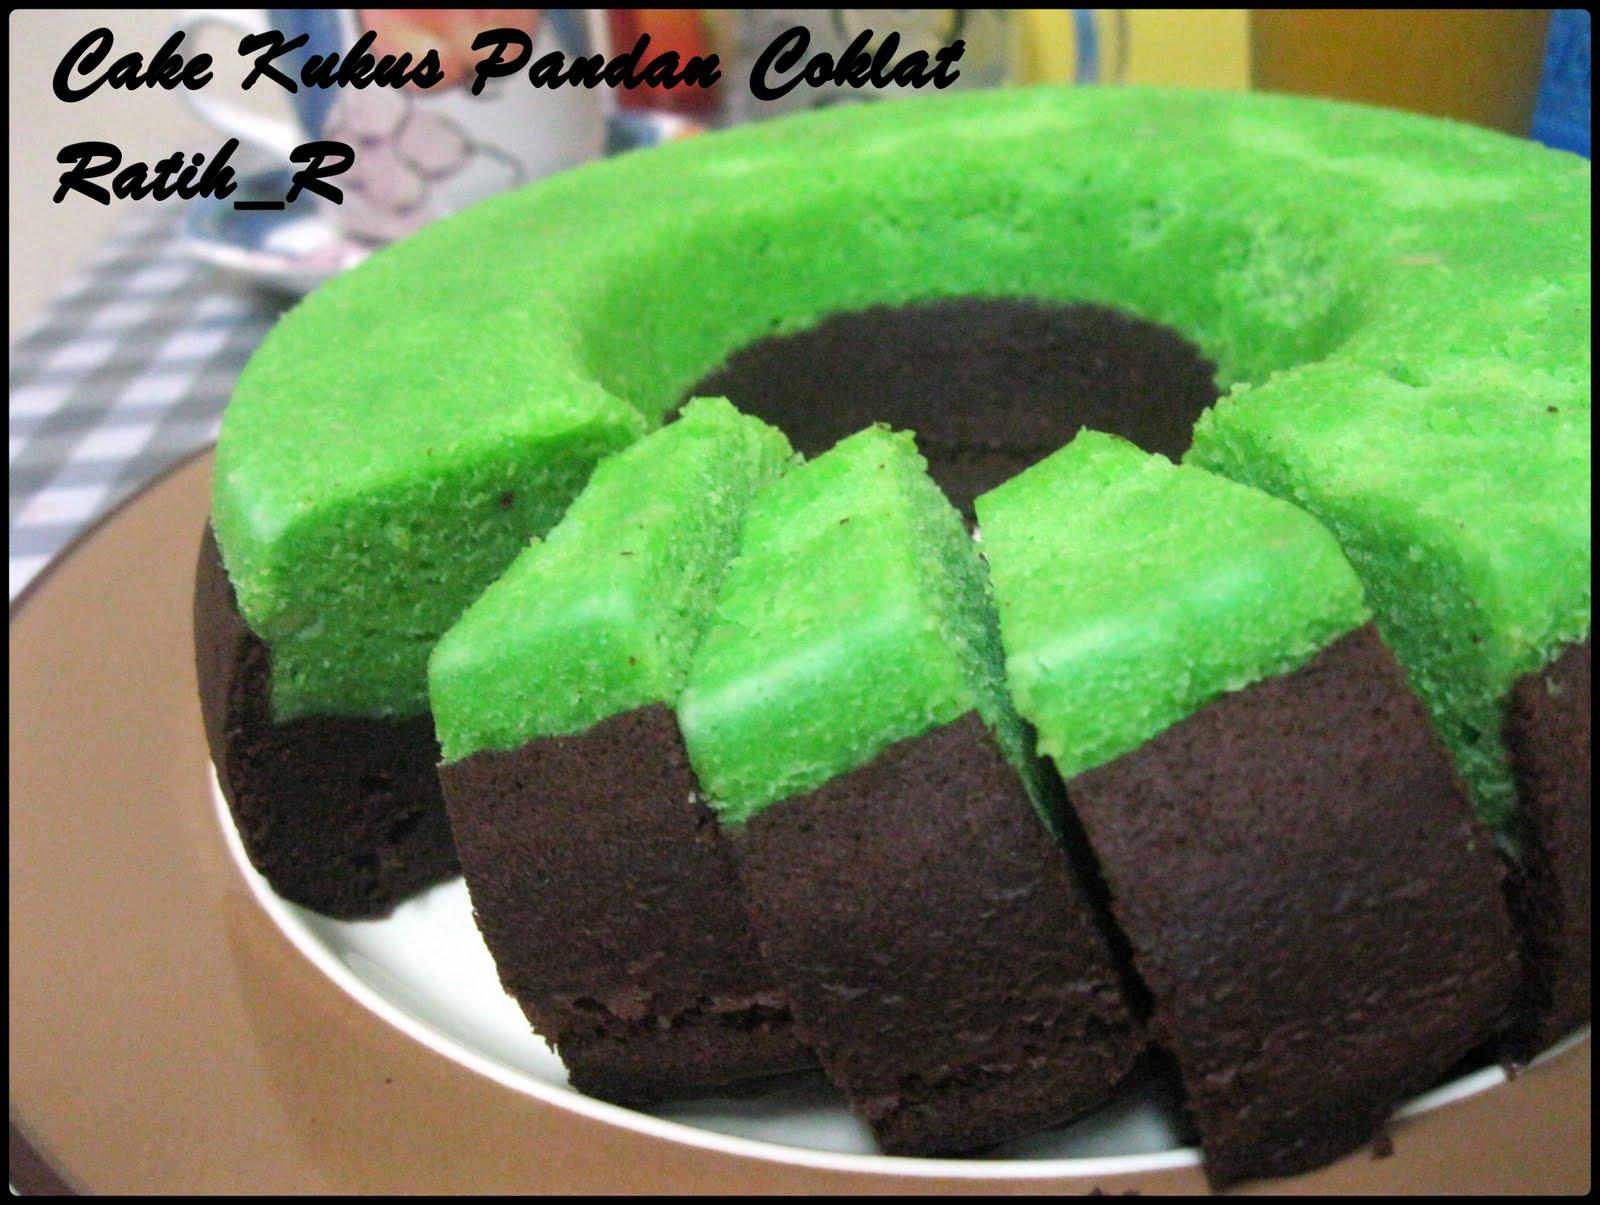 Resep Roll Cake Kukus Ekonomis: Bolu Kukus Pandan Cake Ideas And Designs